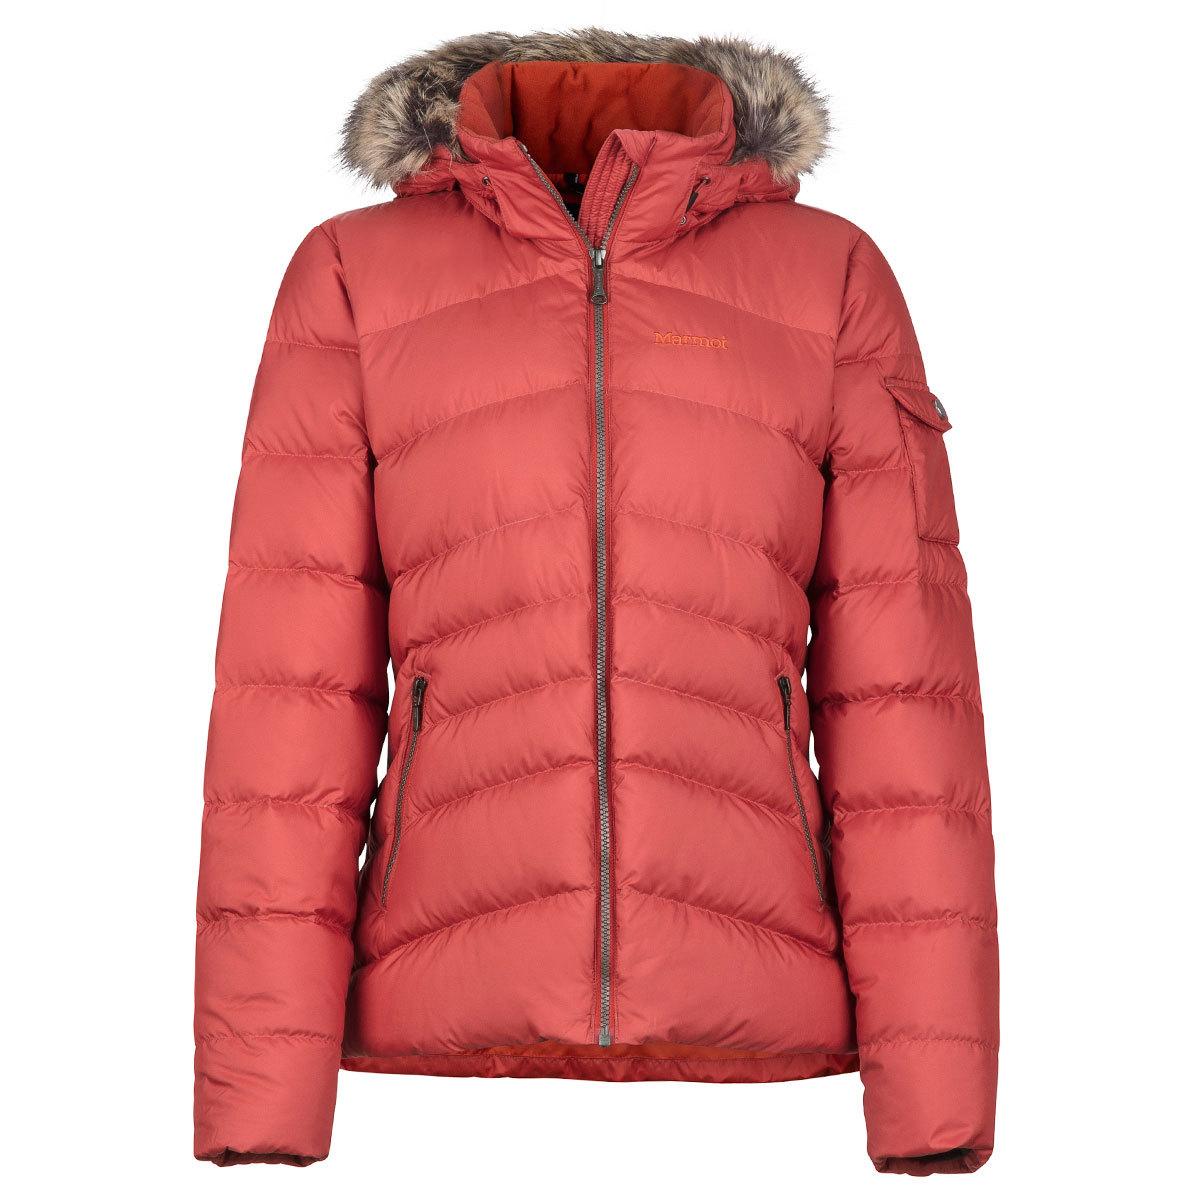 Marmot Woman's Ithaca Jacket - Red, XL